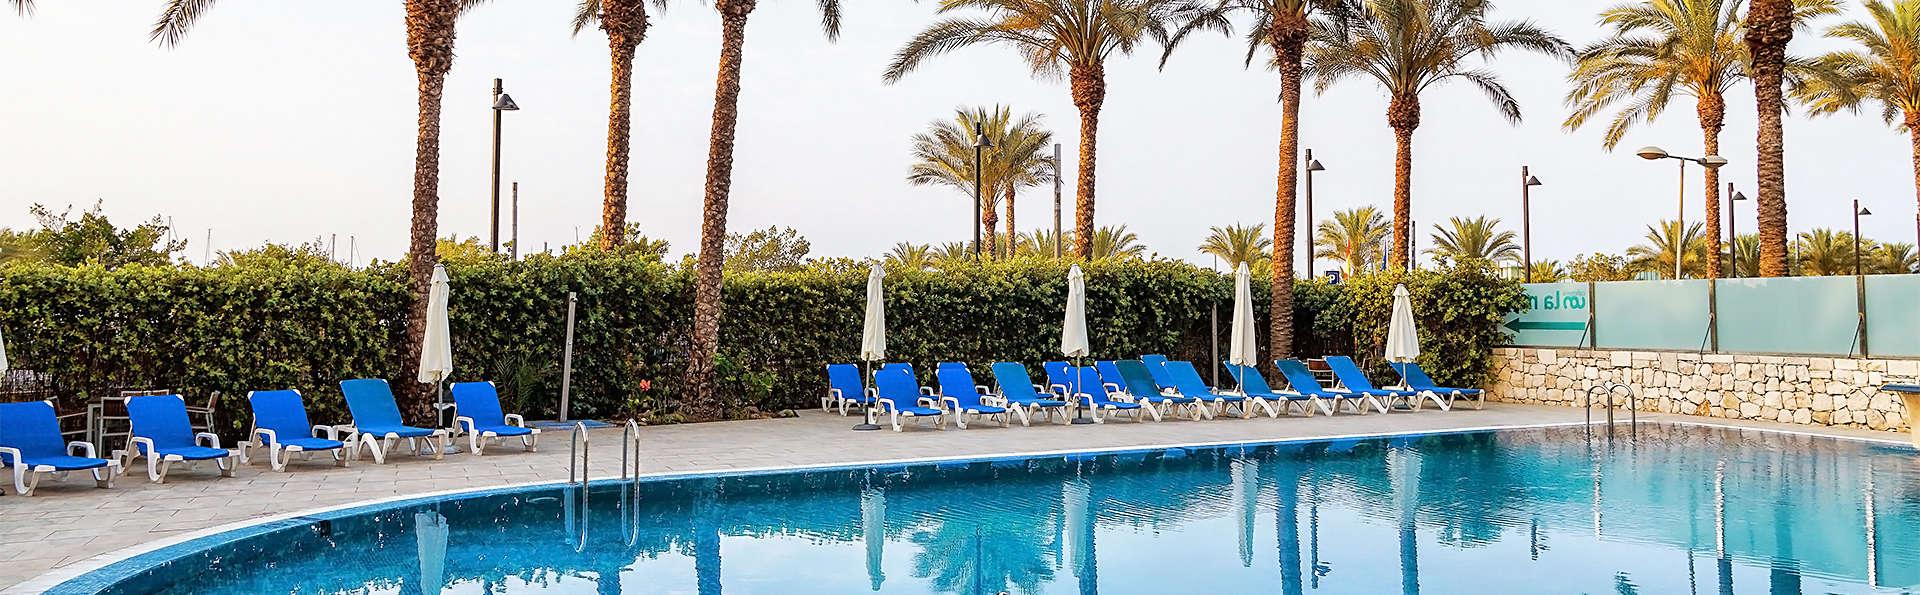 Hotel Puerto Juan Montiel Spa & Base Náutica - EDIT_pool.jpg